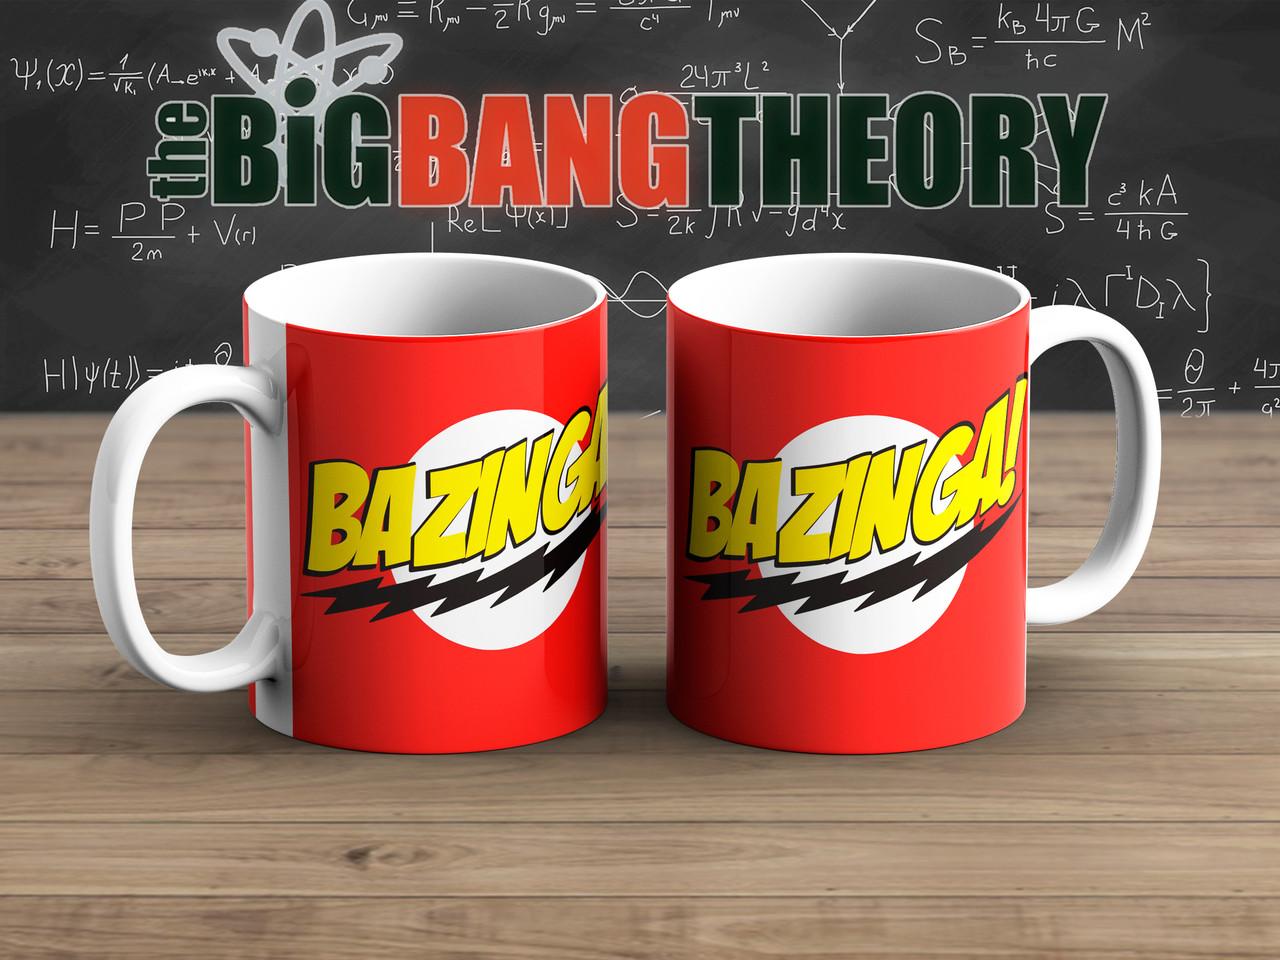 Чашка Bazinga Теория Большого взрыва / The Big Bang Theory